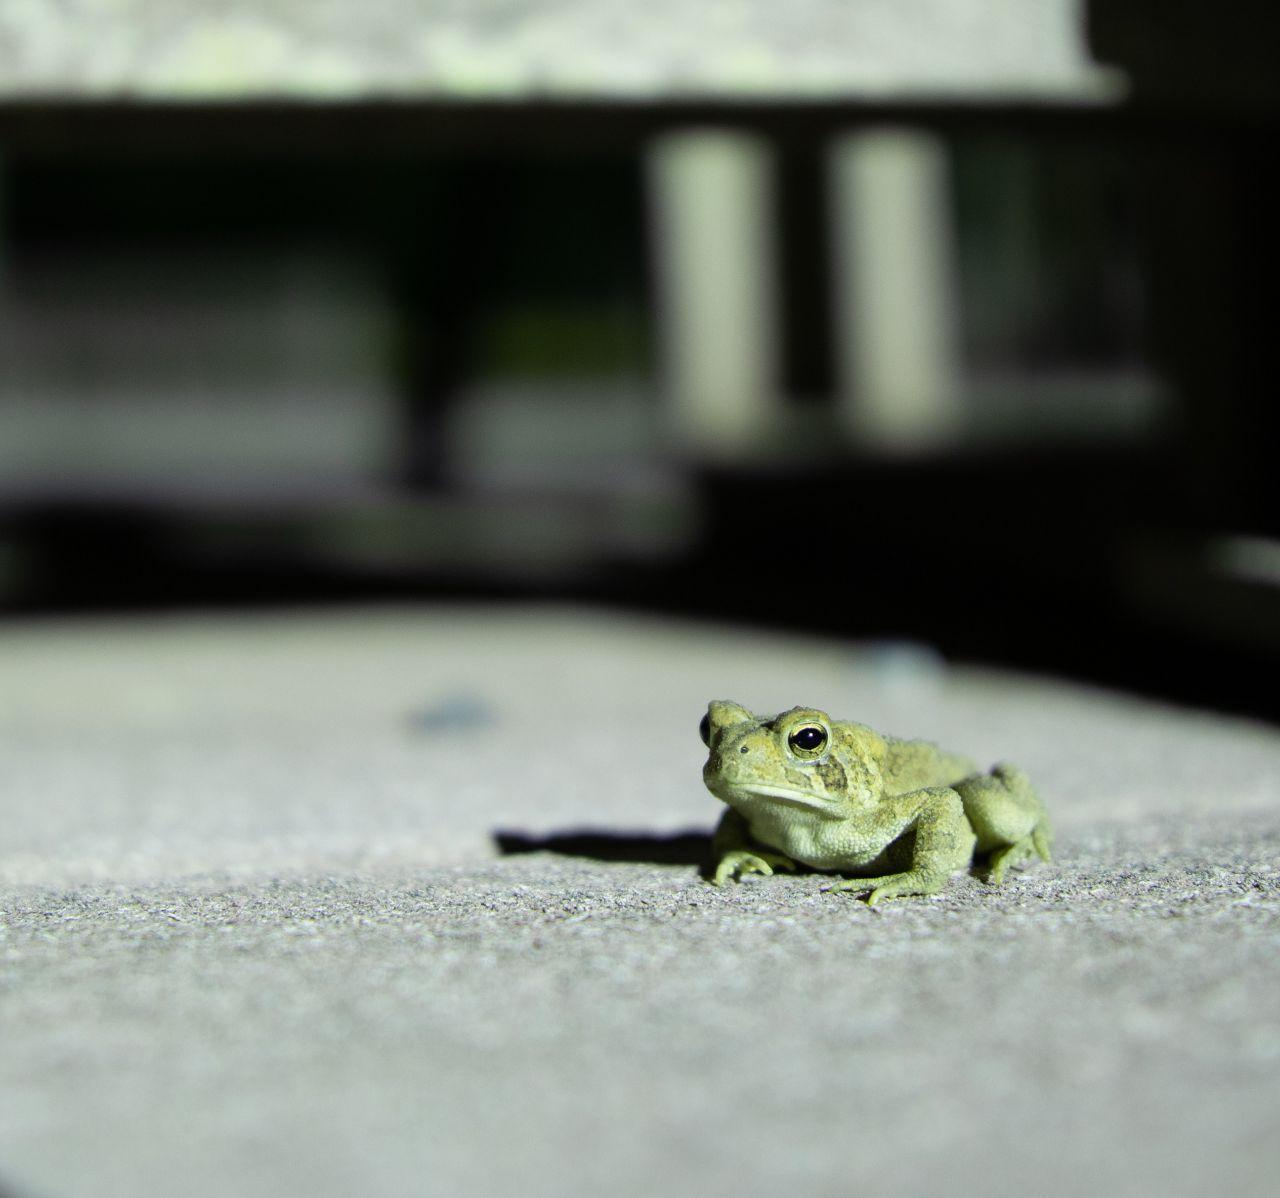 Corpse Run 984.5: Frog!